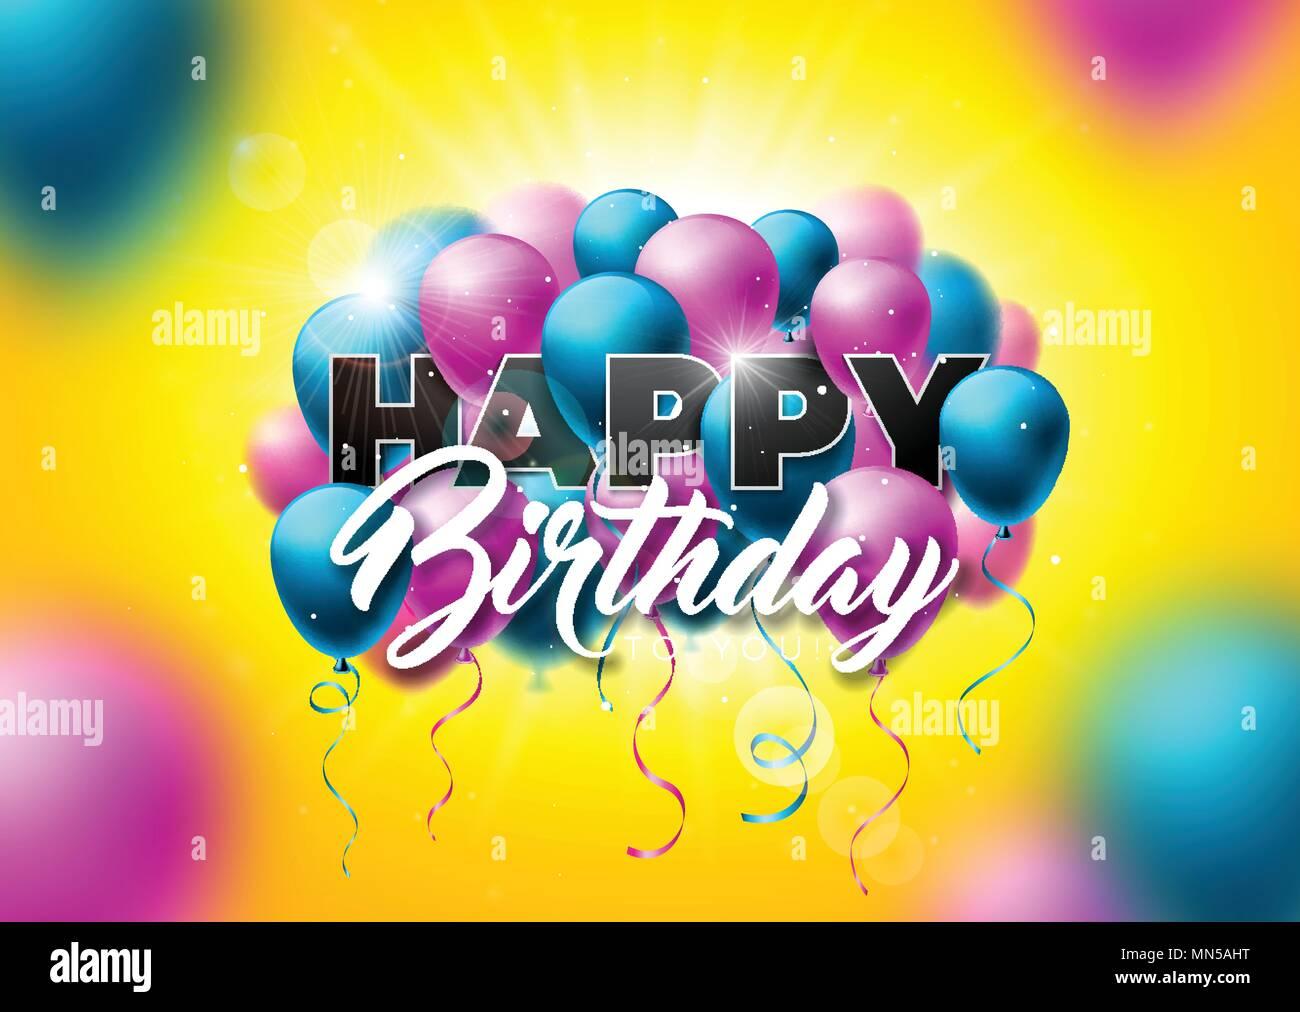 Happy Birthday Design Vector ~ Happy birthday greeting card background vector illustration stock